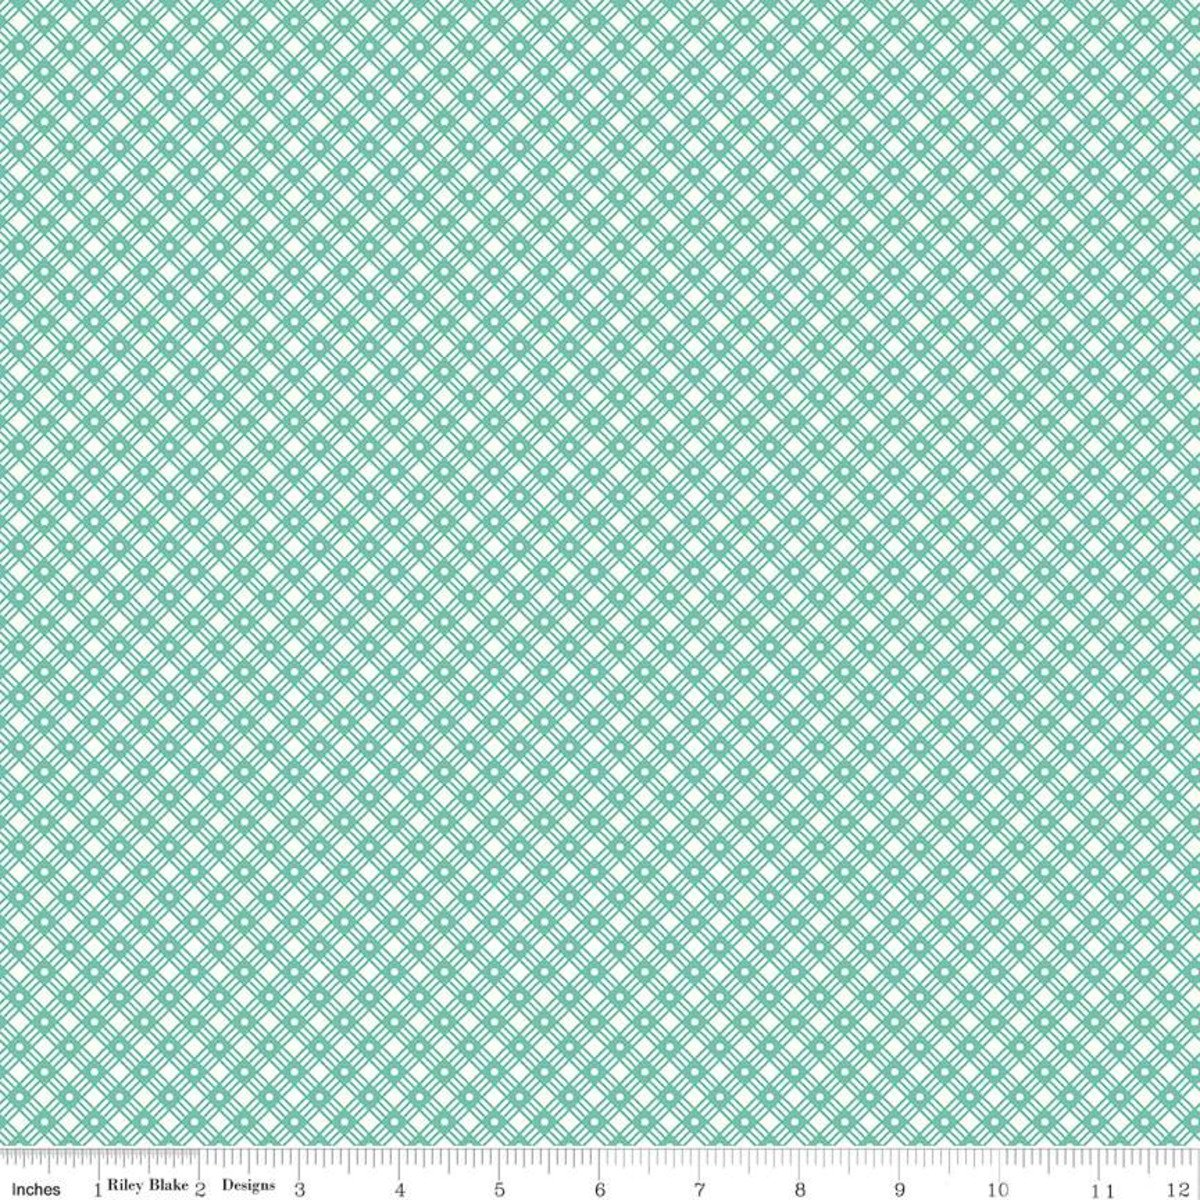 Flea Market C10221 - Seaglass